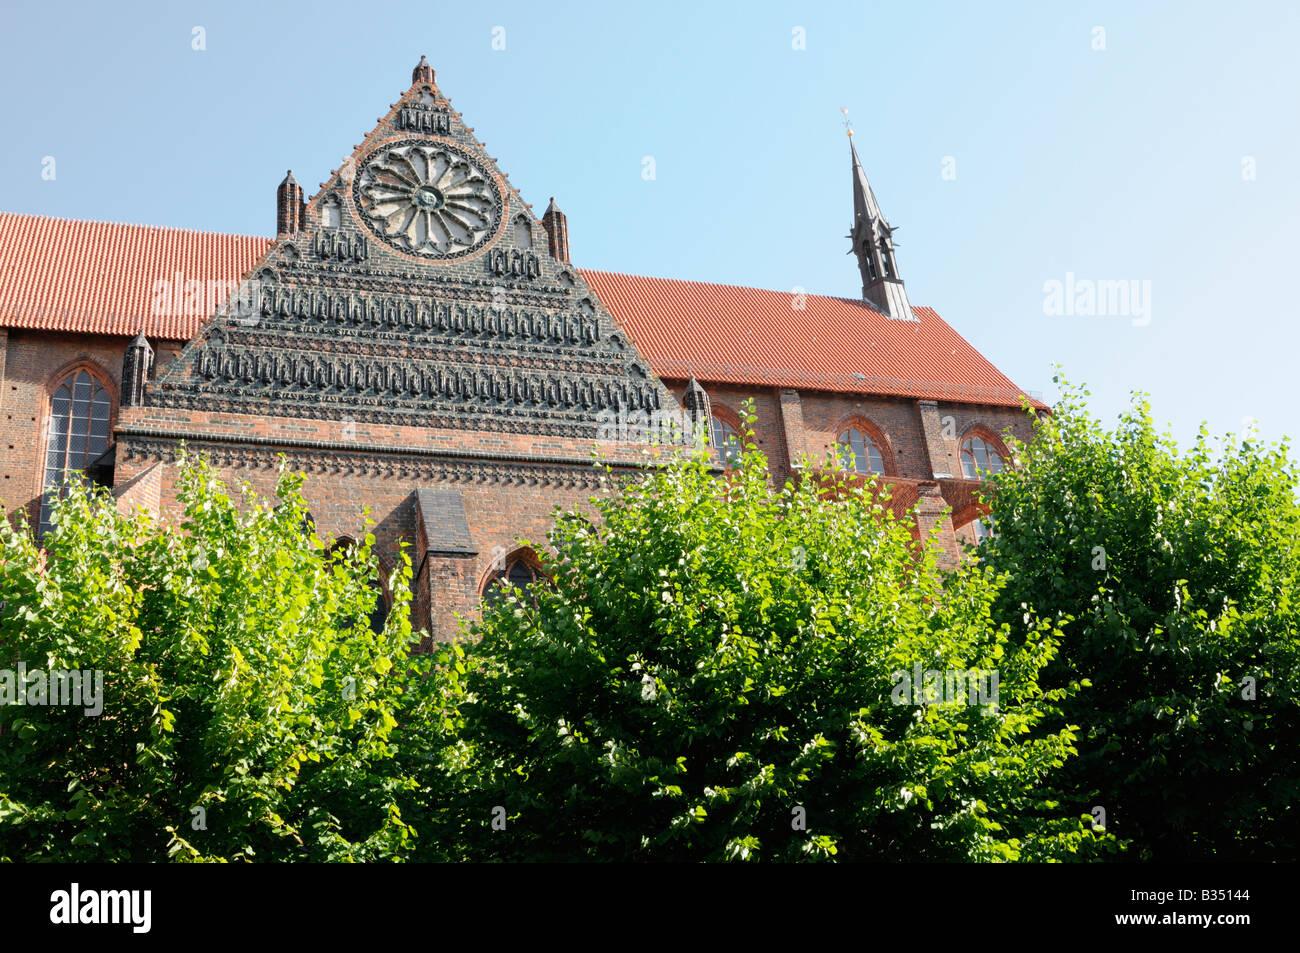 St. Nikolai Kirche in Wismar, Deutschland. - St. Nikolai Church in Wismar, Germany. - Stock Image